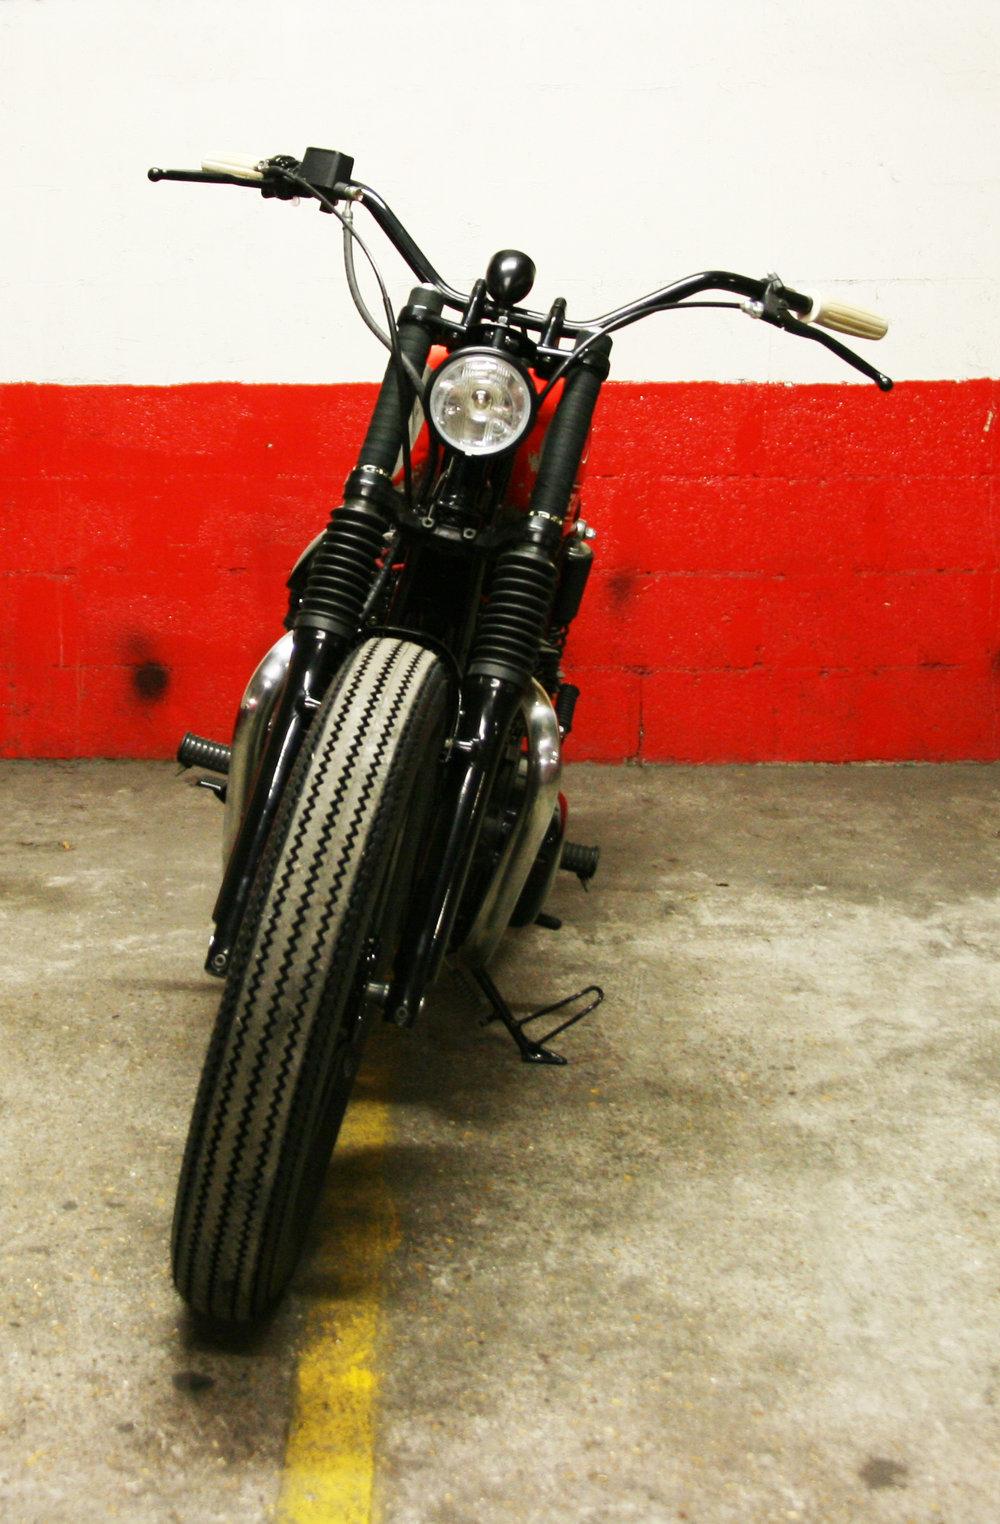 -  Brembo  front brake master cylinder;  -  Bates  type headlight.